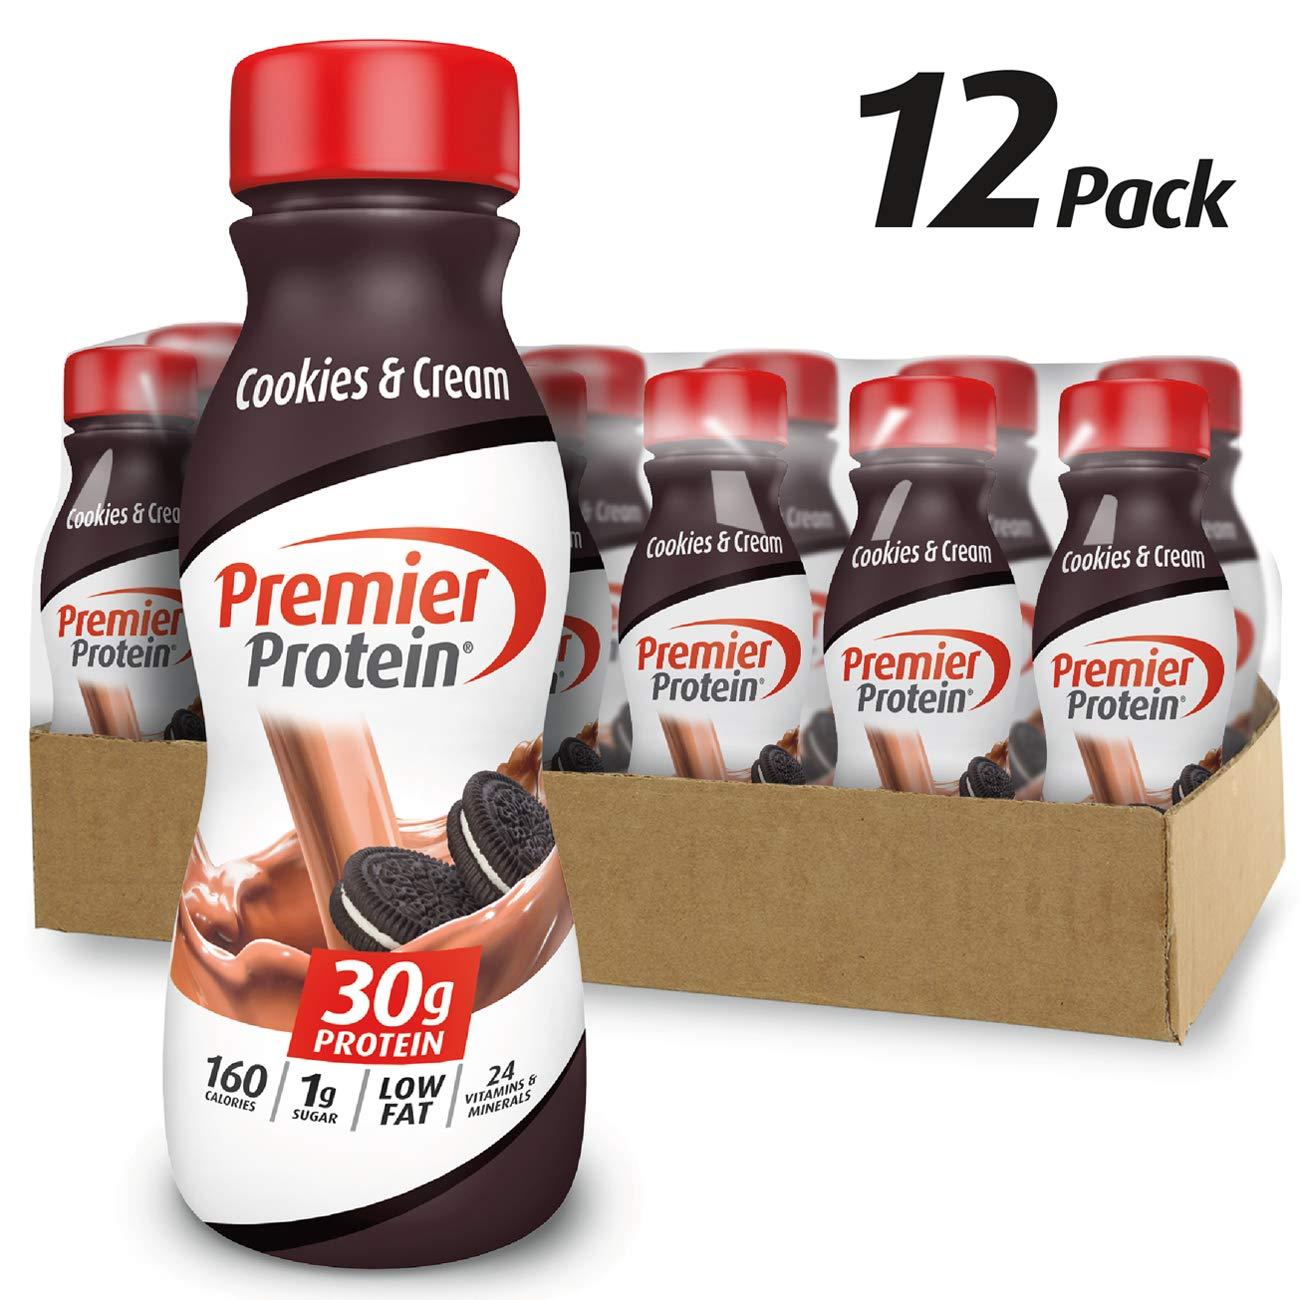 Premier Protein 30g Protein Shake, Cookies & Cream, 11.5 fl oz Shake, (12 count) by Premier Protein